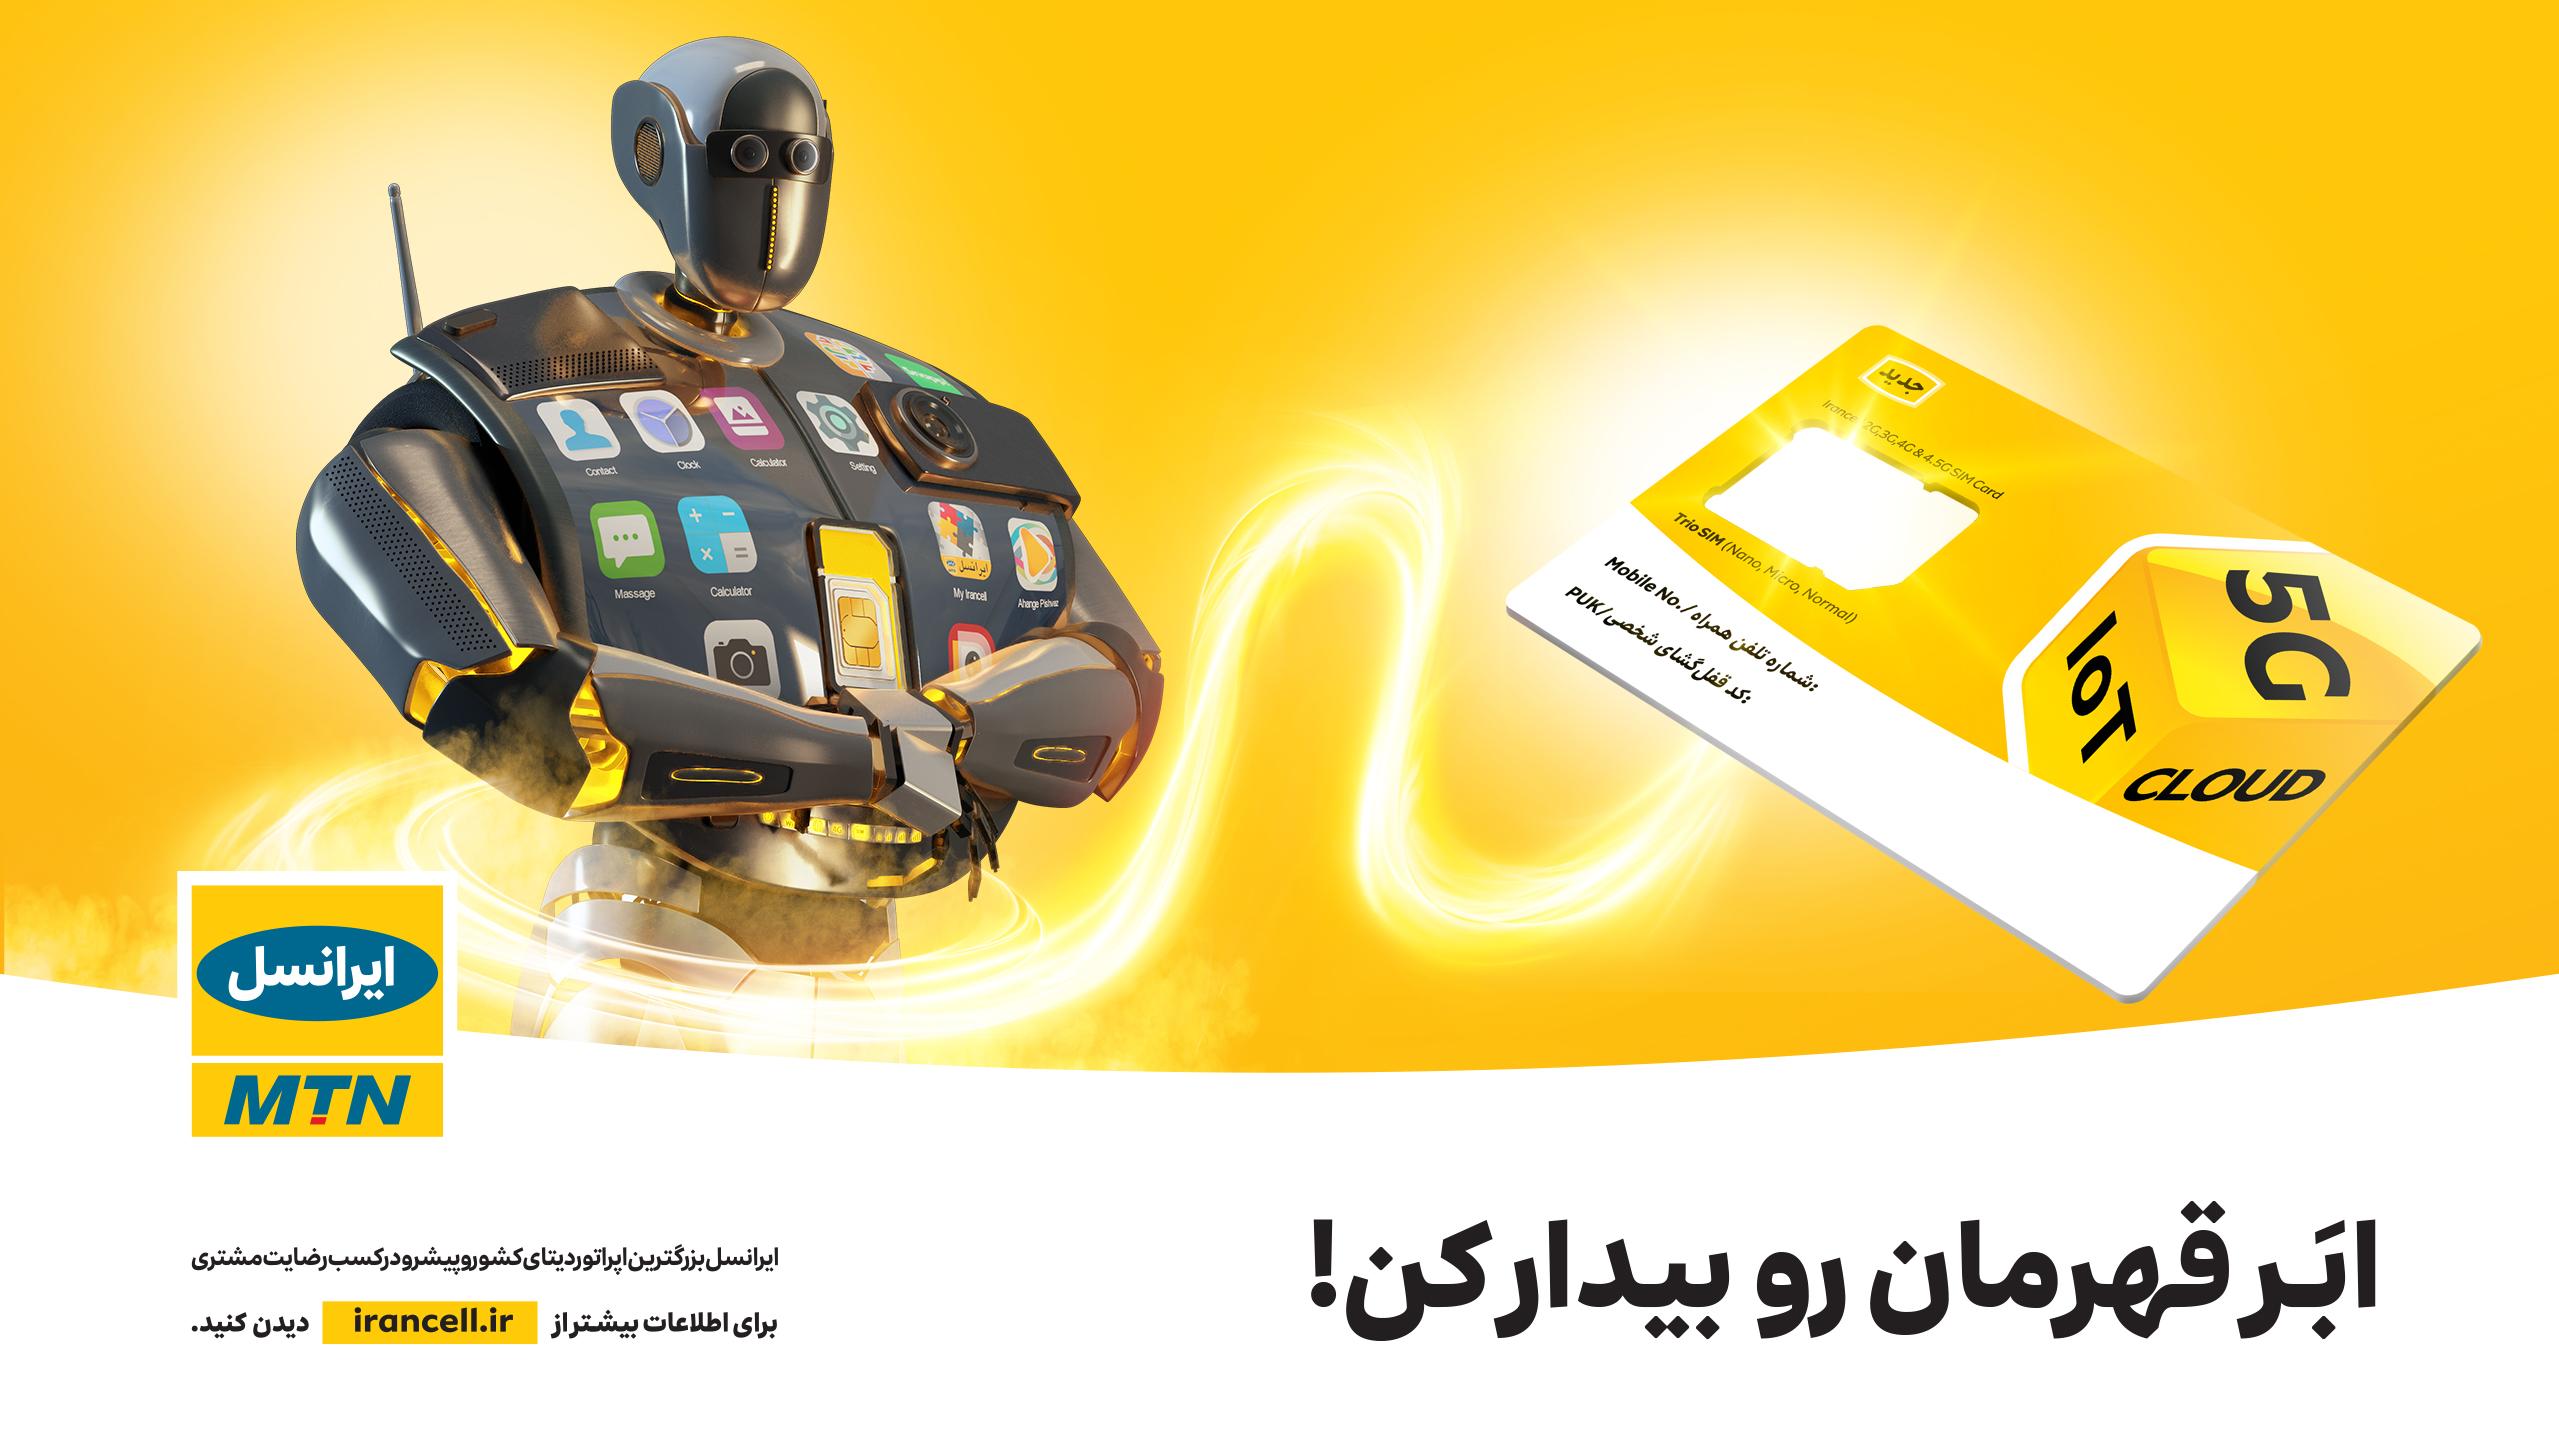 Irancell, Smartphone Campaign – 1001 Branding